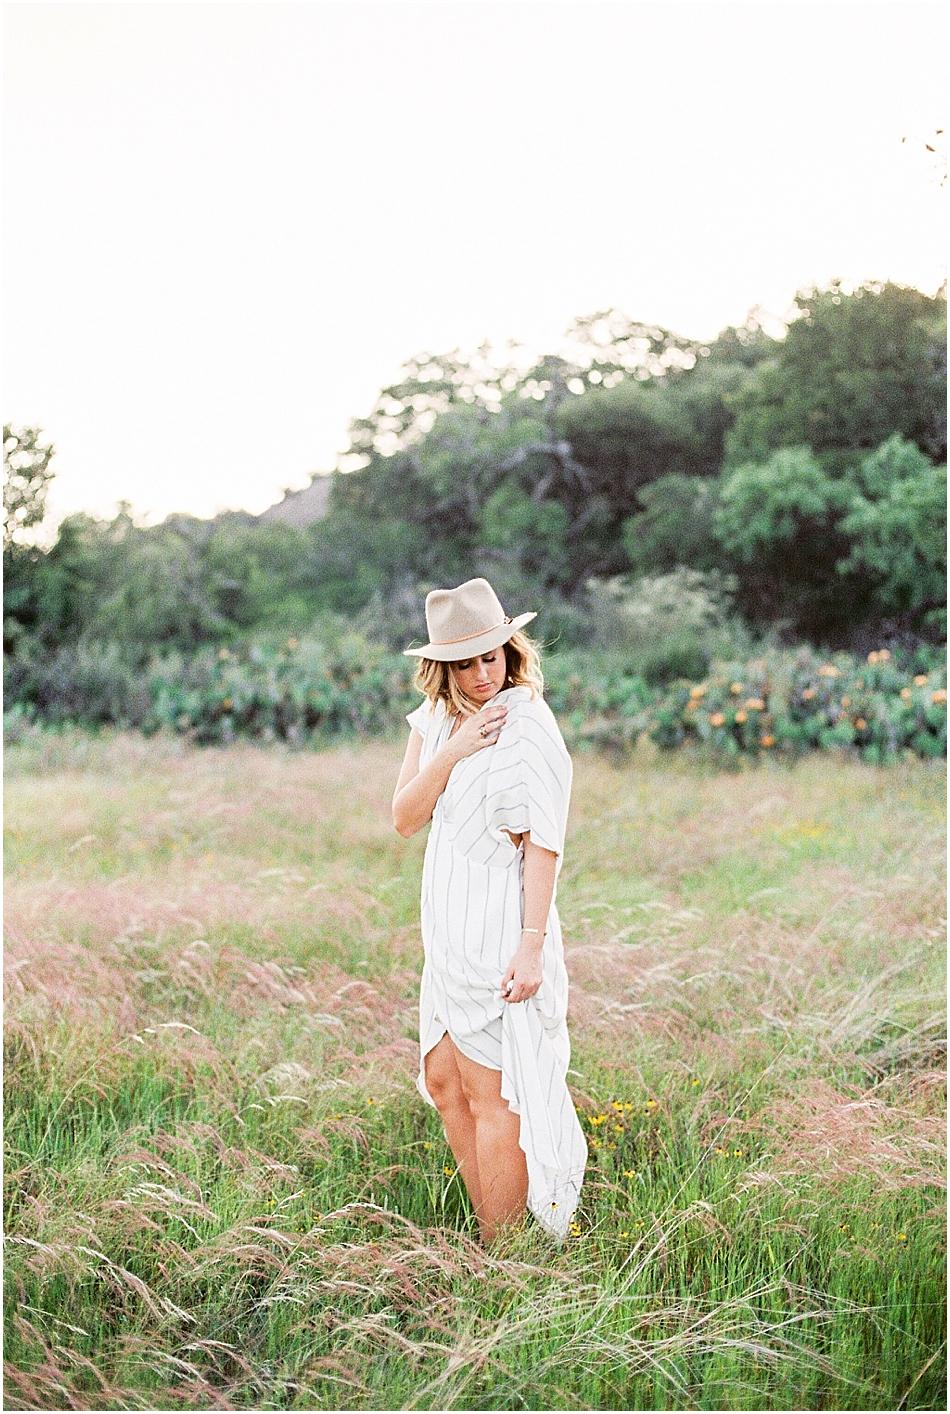 Emilie Anne Photography   Fine Art Film   Central Texas   Enchanted Rock   Seniors-2.jpg